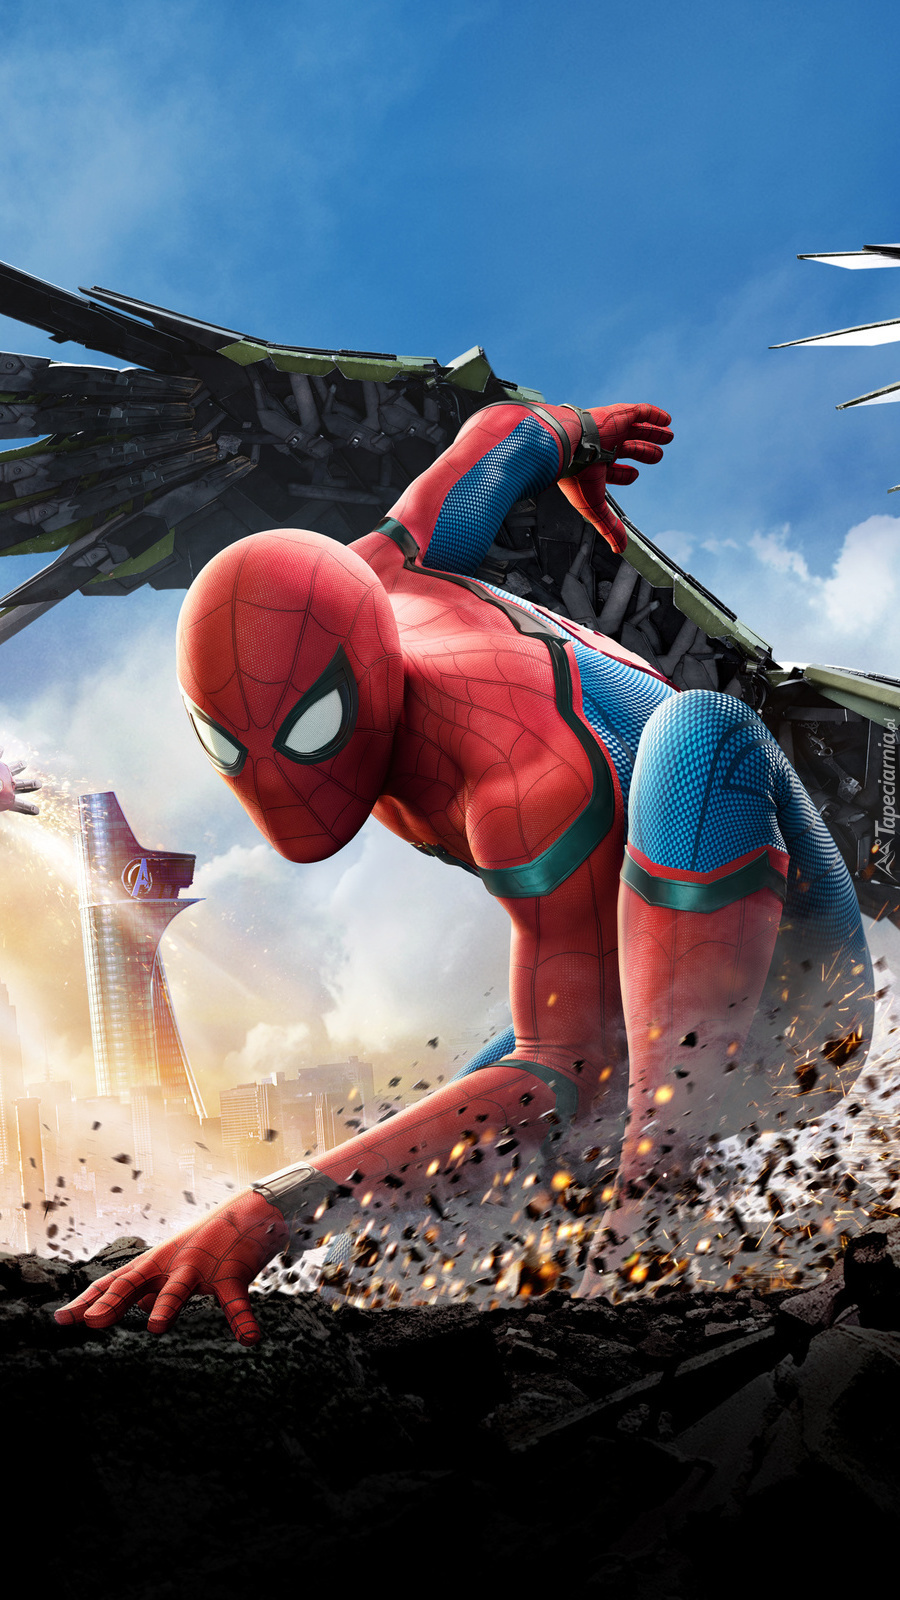 Spider-Man w akcji